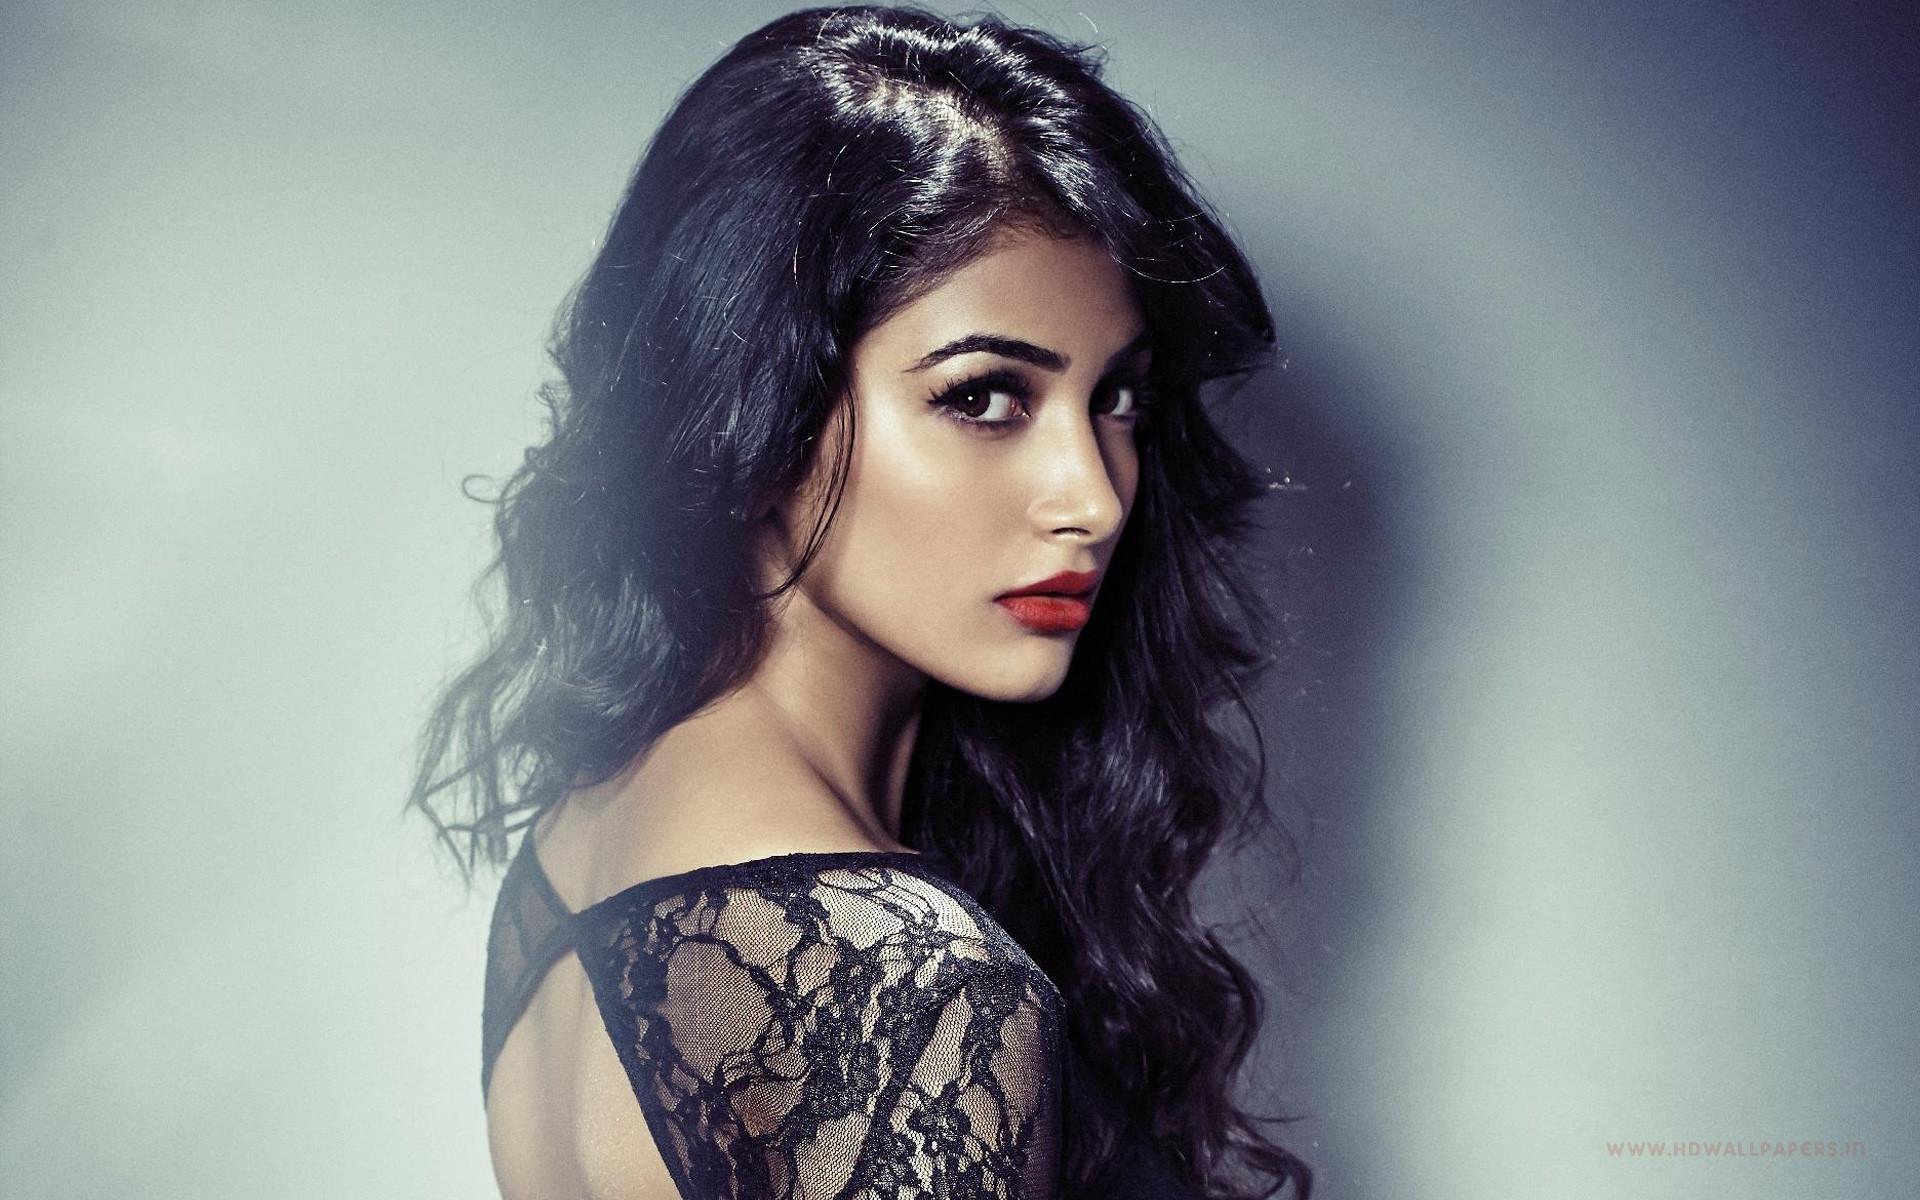 bollywood actress pooja hegde hd wallpaper